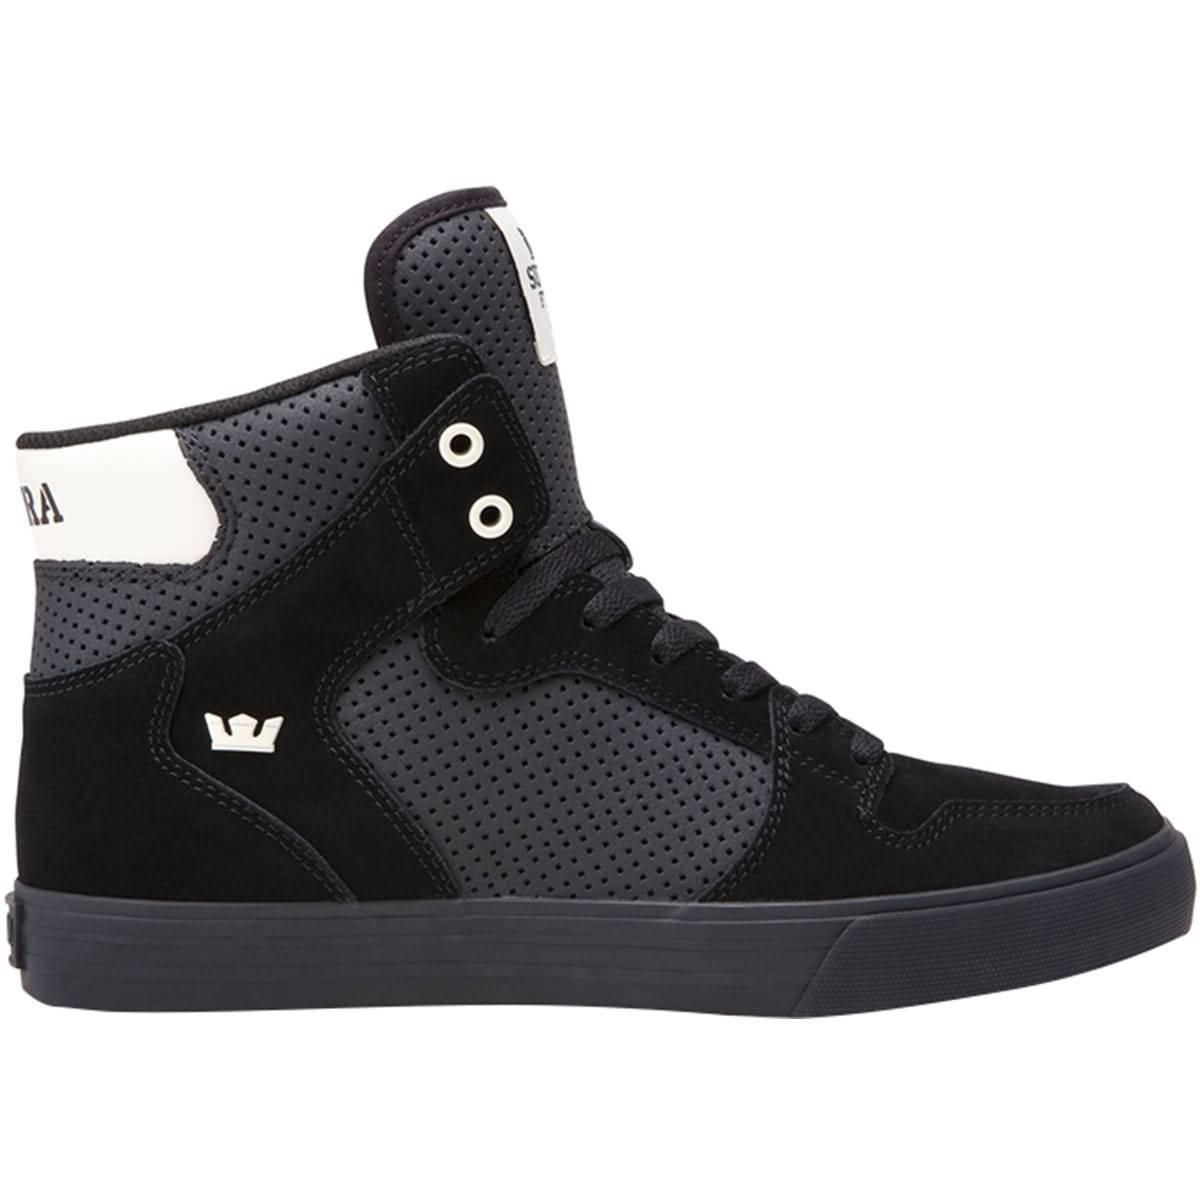 Supra Vaider LC Sneaker B078ZKVVX6 9.5 M US|Black/Off White-black